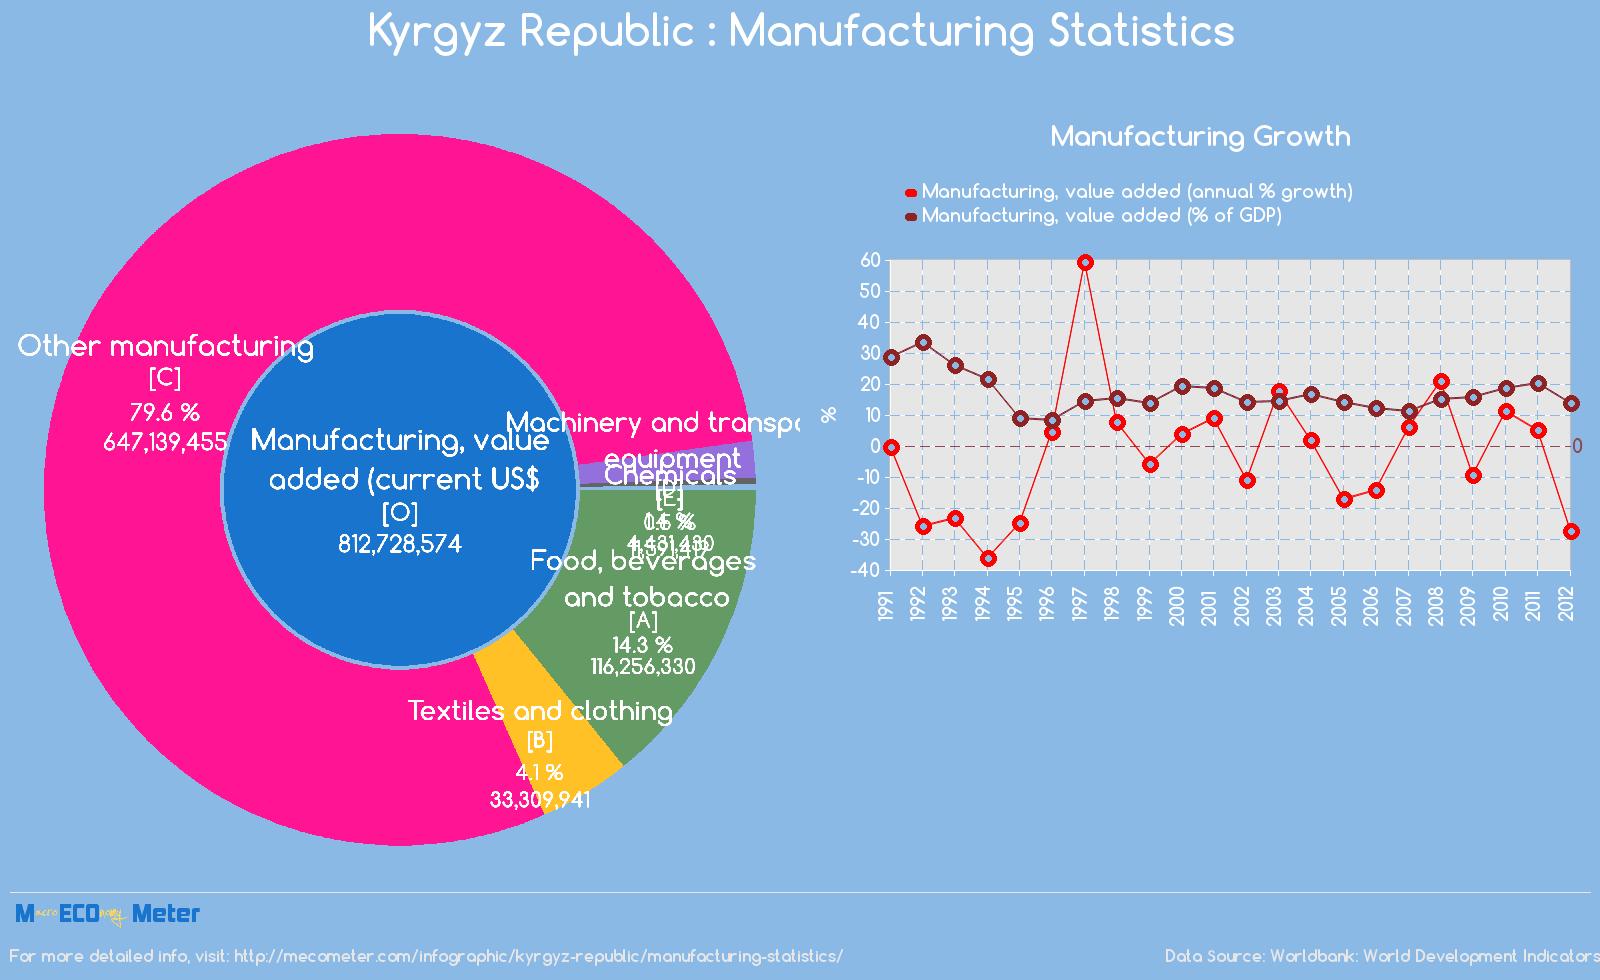 Kyrgyz Republic : Manufacturing Statistics